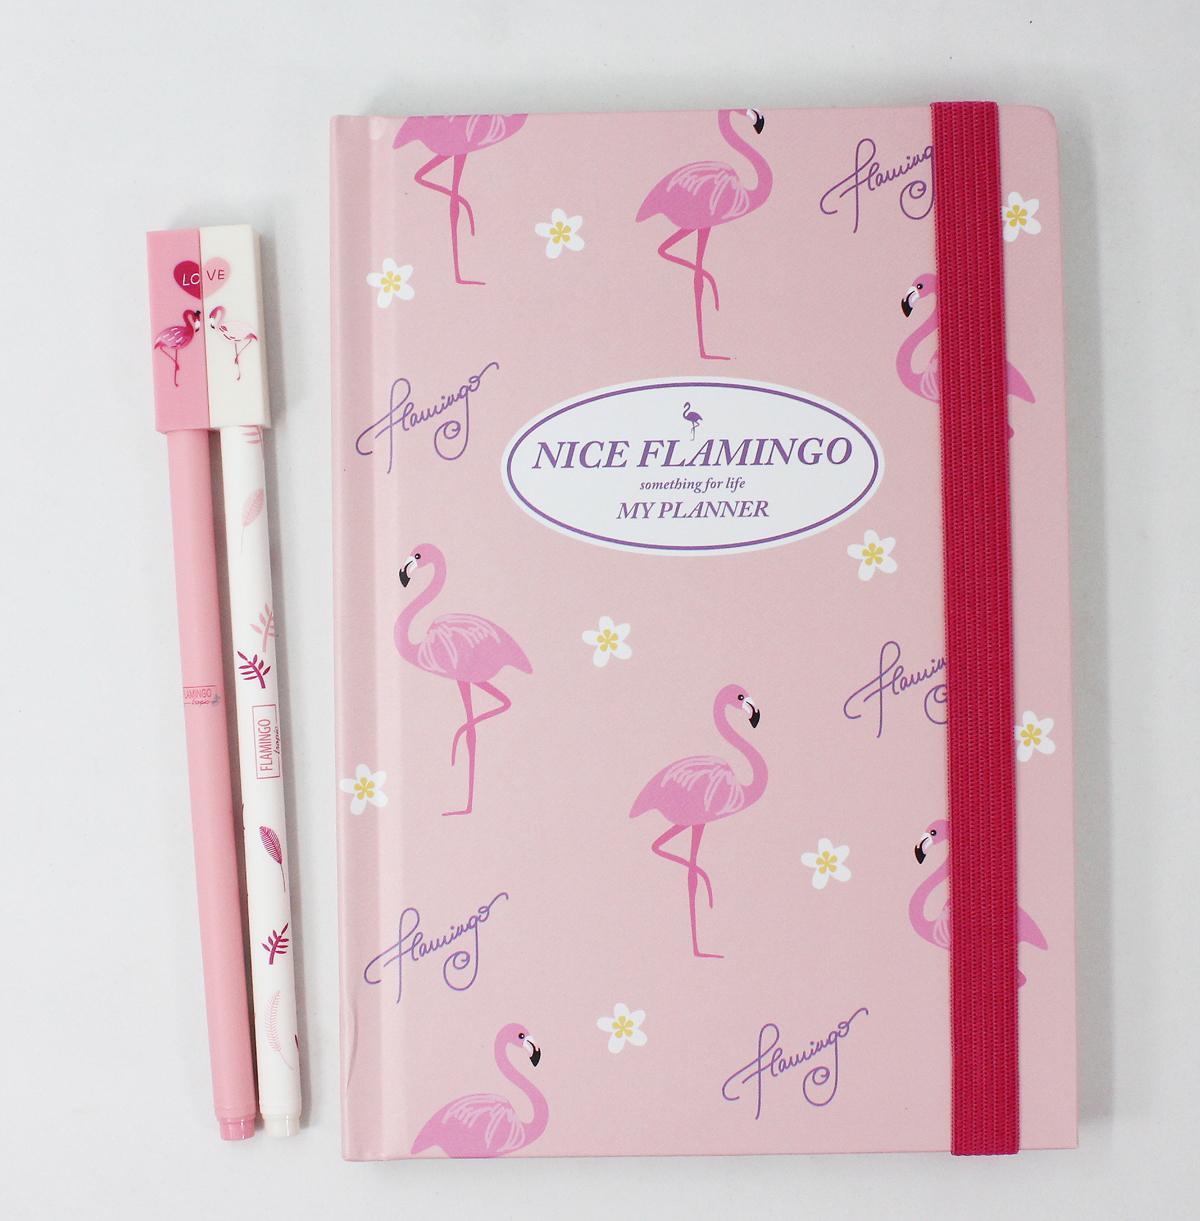 Flamingo Planner With 2 Pcs Gel Pen